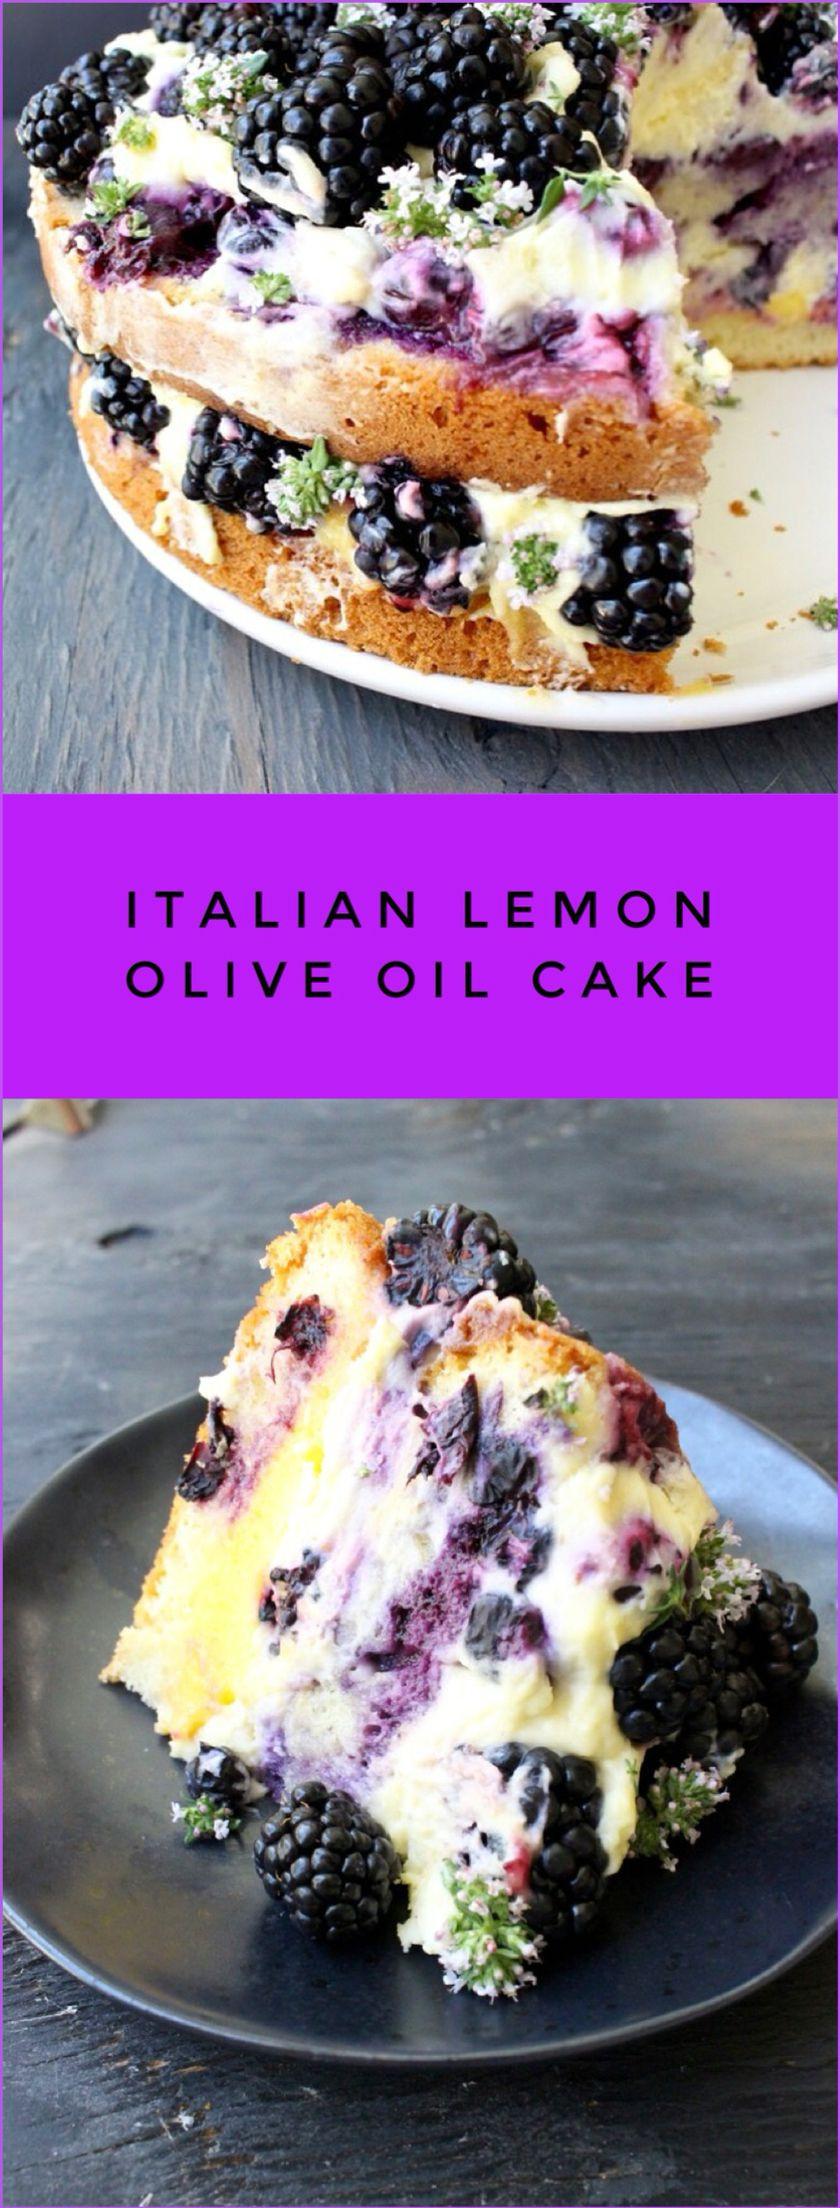 Italian Summer Desserts  Italian Lemon Olive Oil Cake Recipe with Berries and